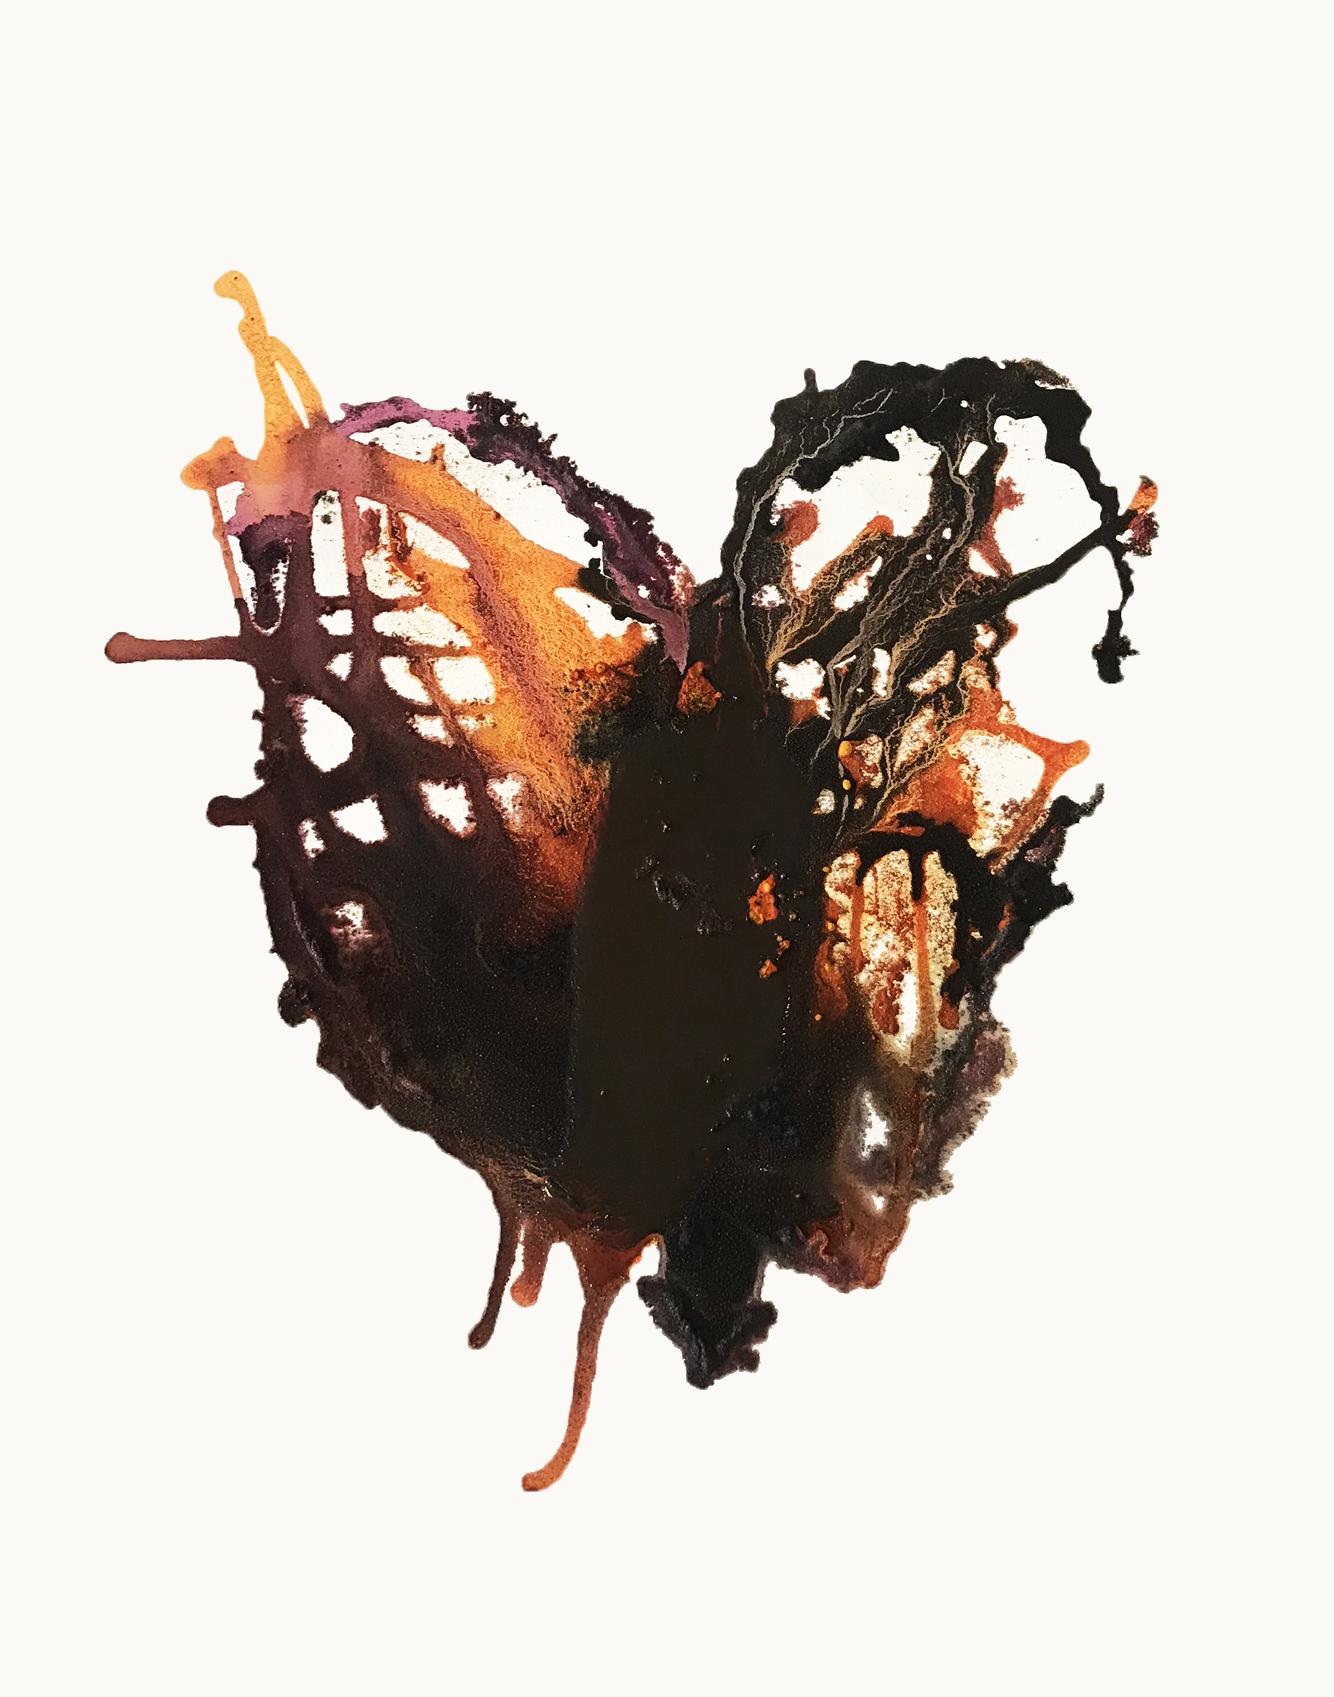 SEVERED HEART-edit3.jpg